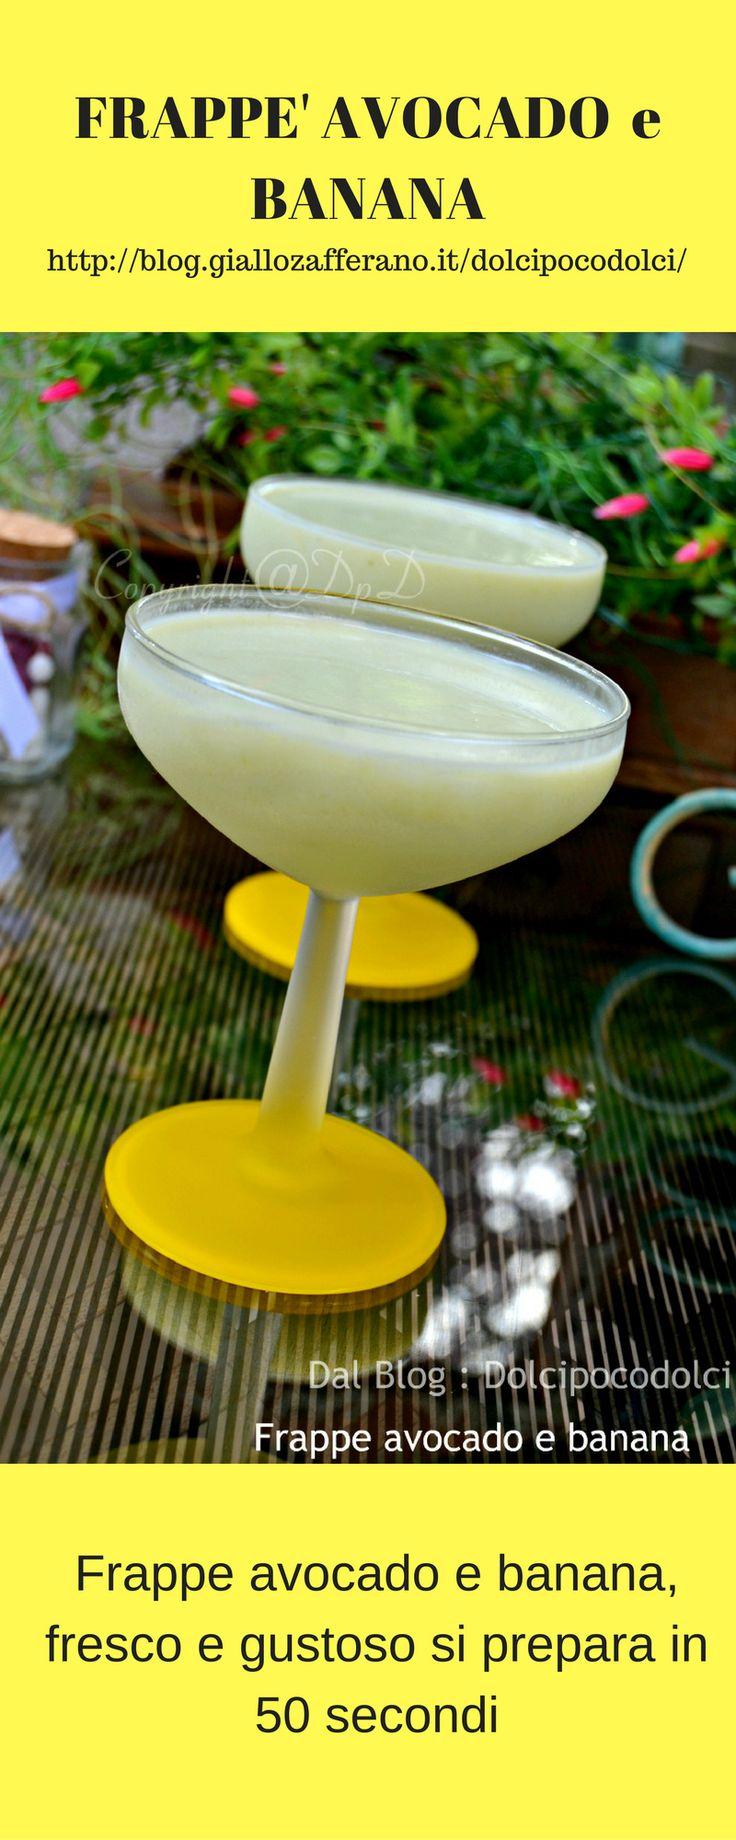 #Frappè #Avocado e #banana ! #Ricetta #bevande #tropicale di #dolcipocodolci #blog #cucina #Estive #Salutari #Fredde #Drinks #Dissetanti #Fresche